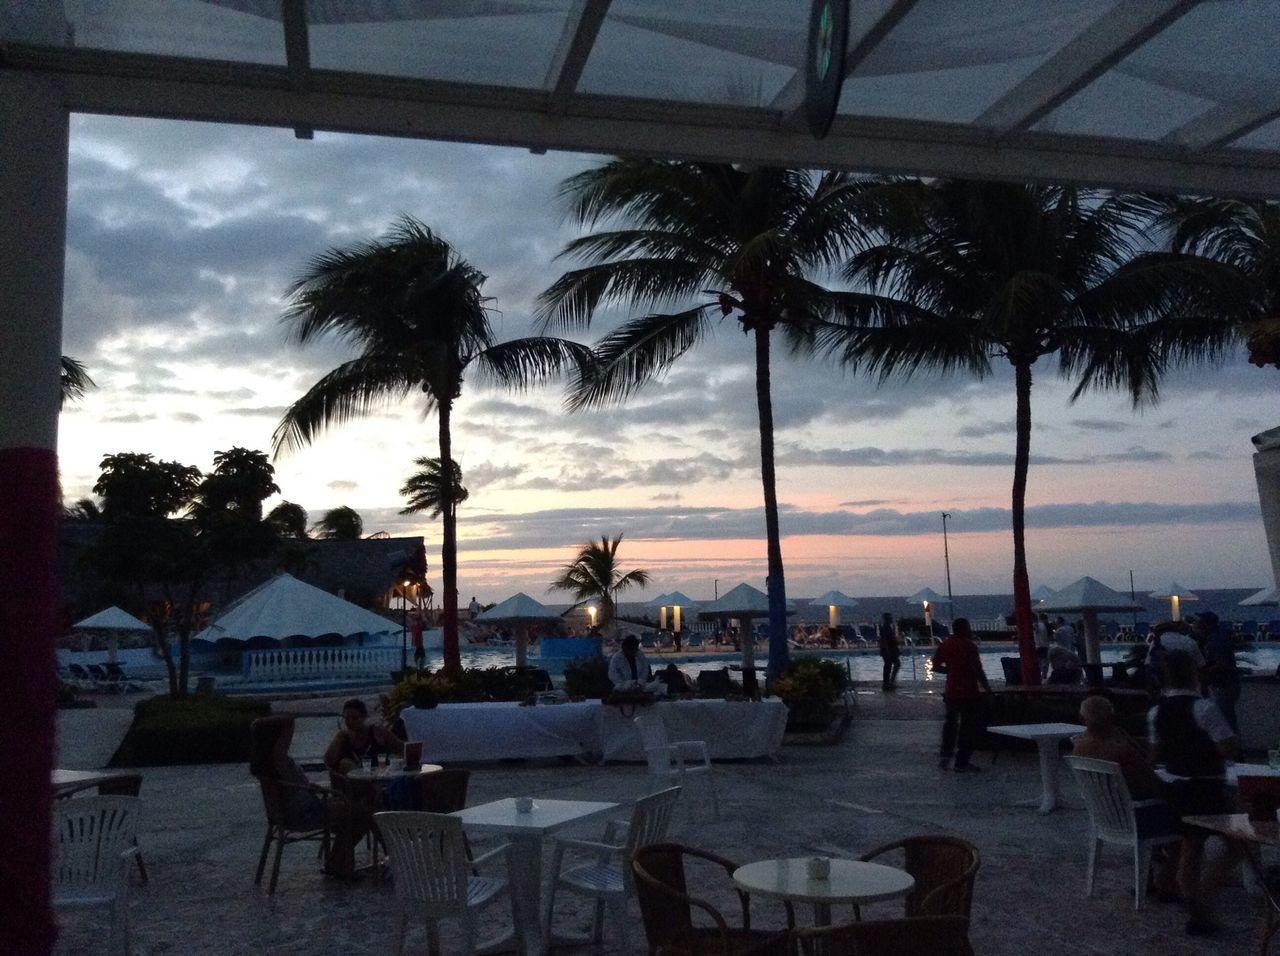 Cuba Caribbean Sky Sunset Pool Palm Trees